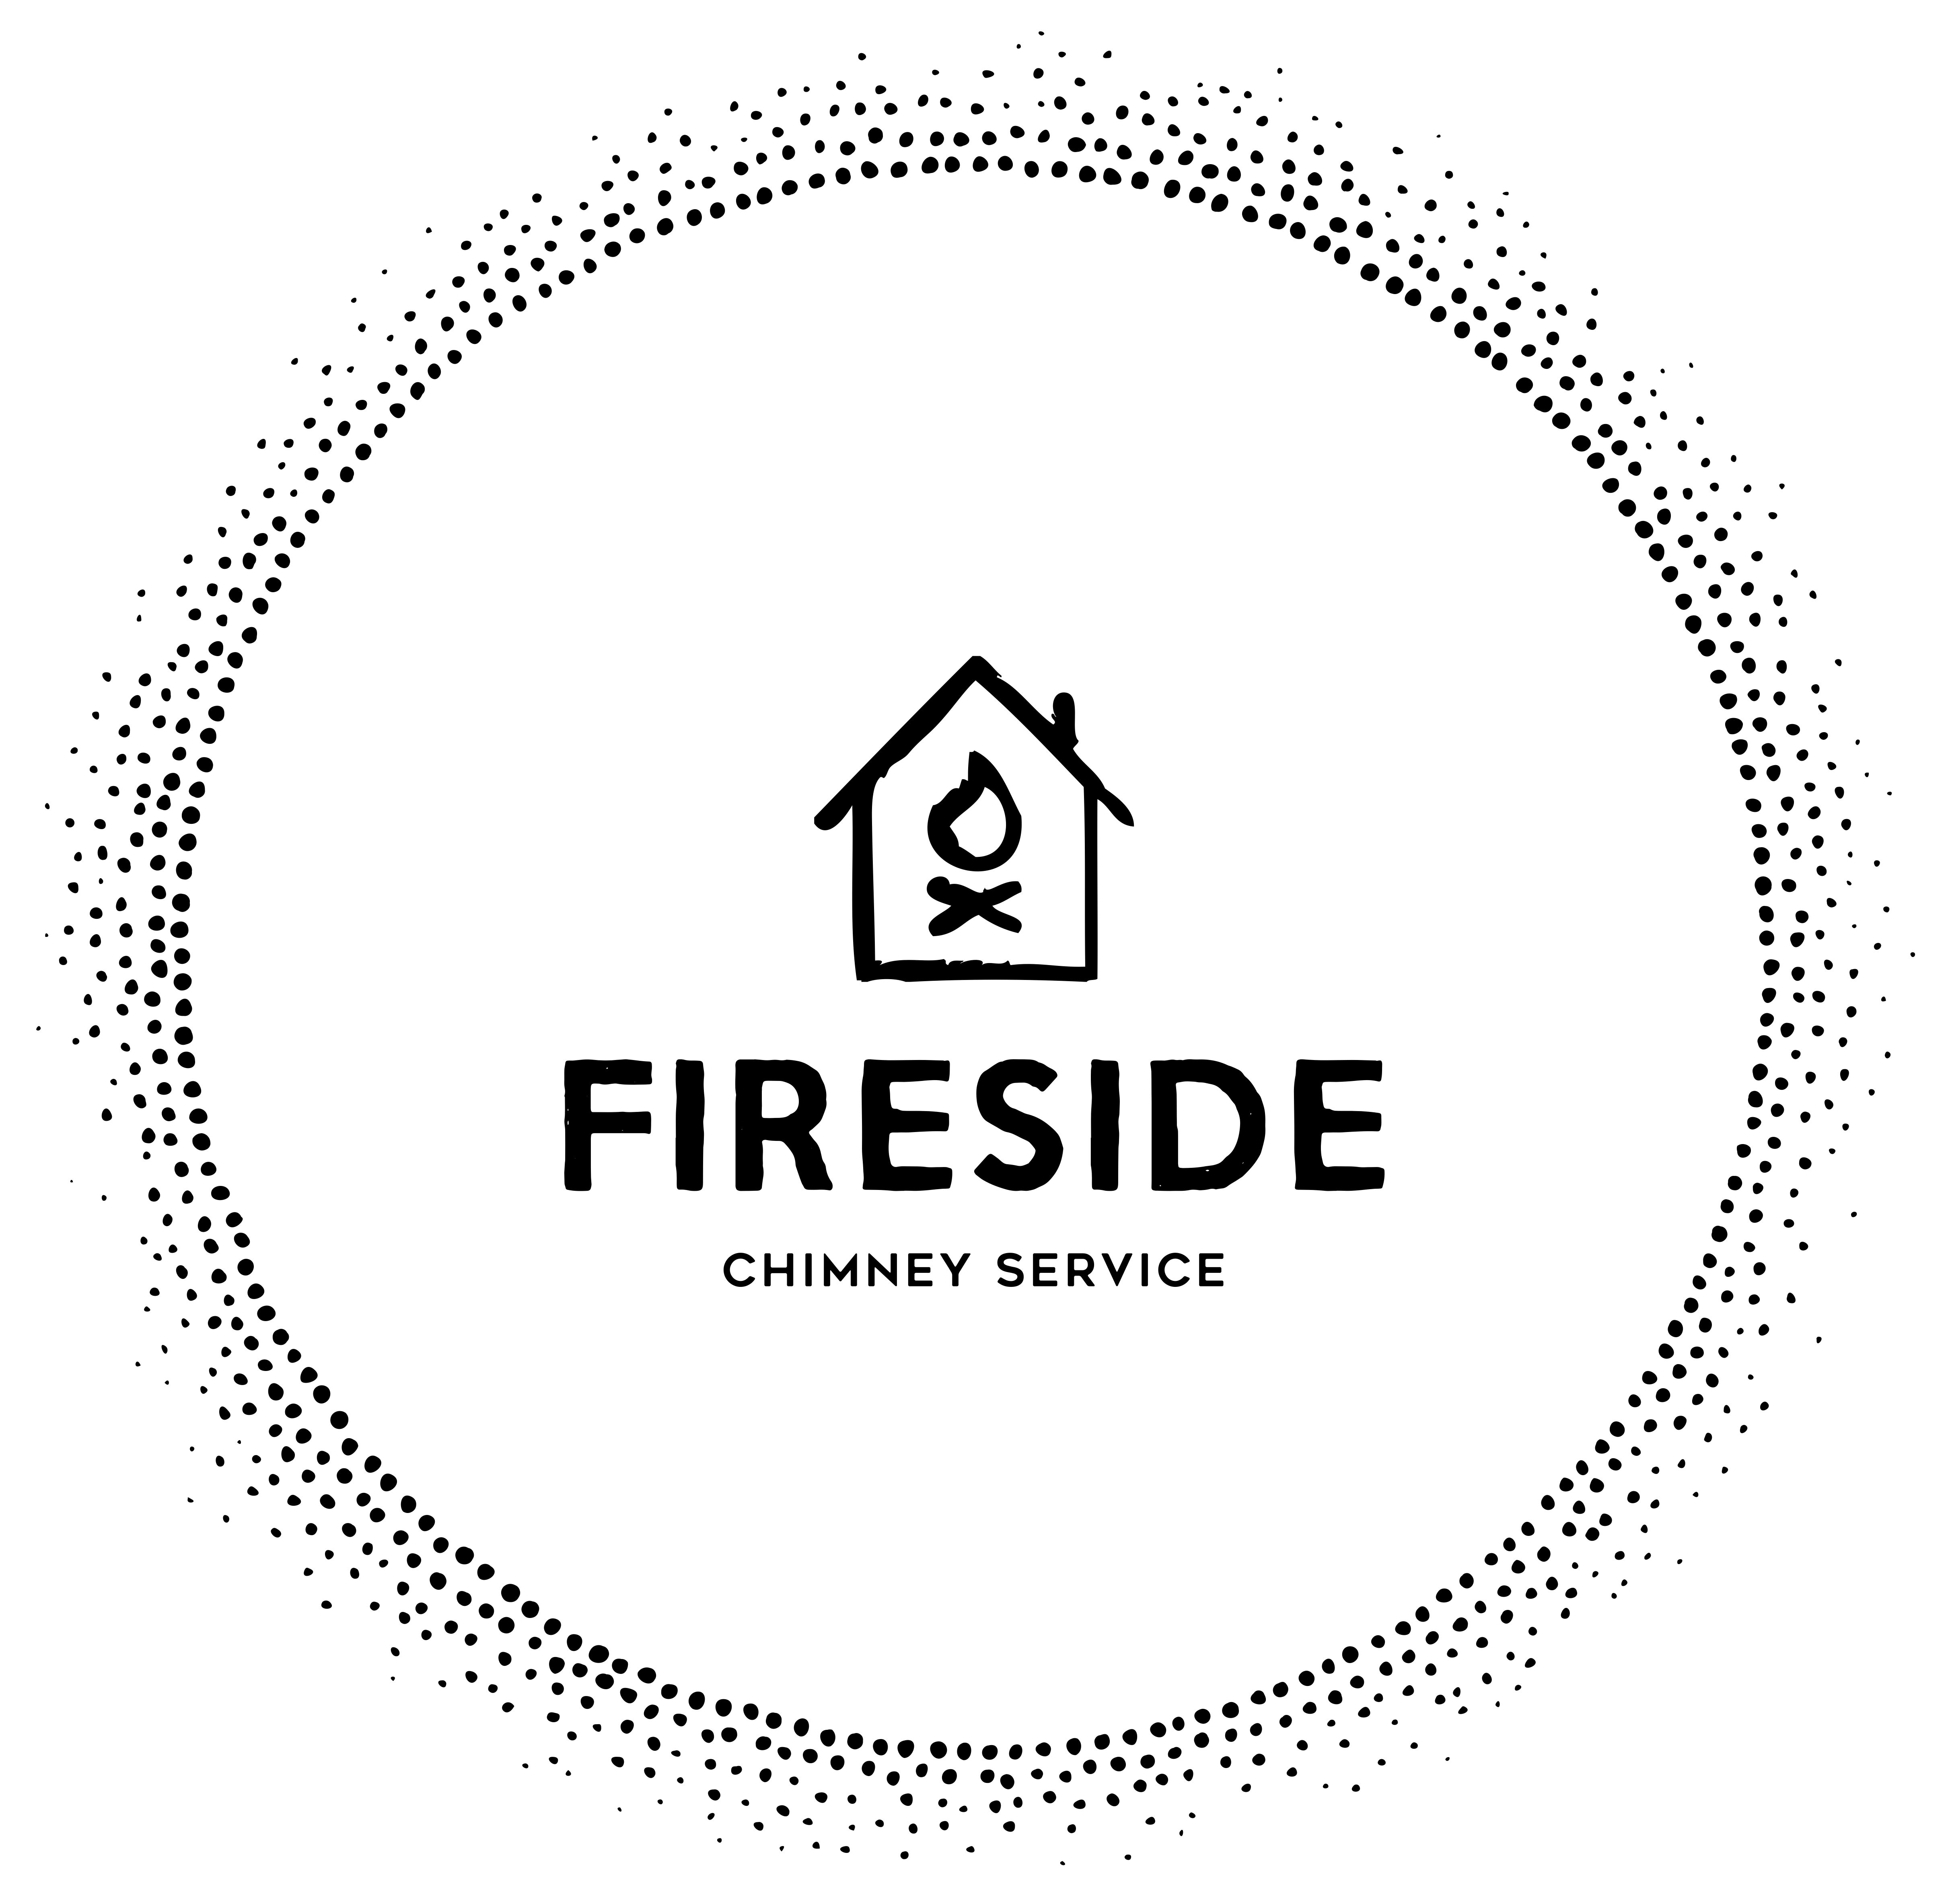 Fireside Chimney Service